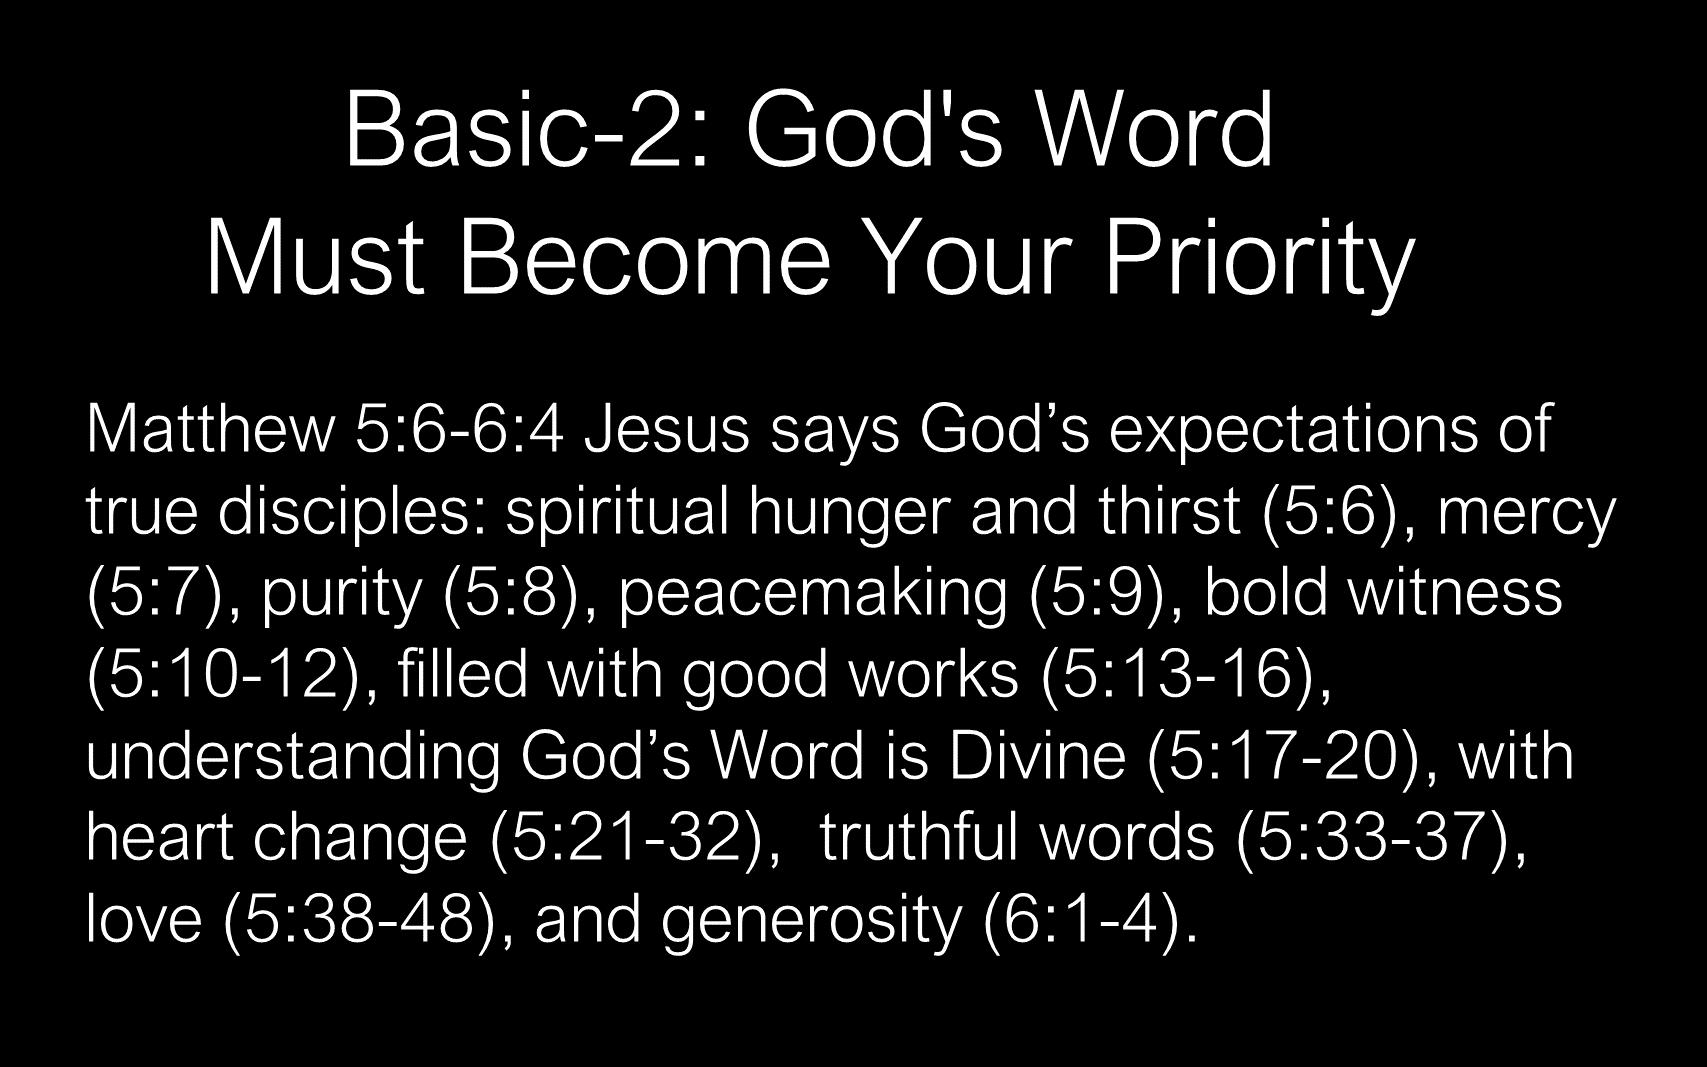 ESH-11 - The Discipline Of Disciple-Making - Disciples - Follow Christ & Make Disciples (16)